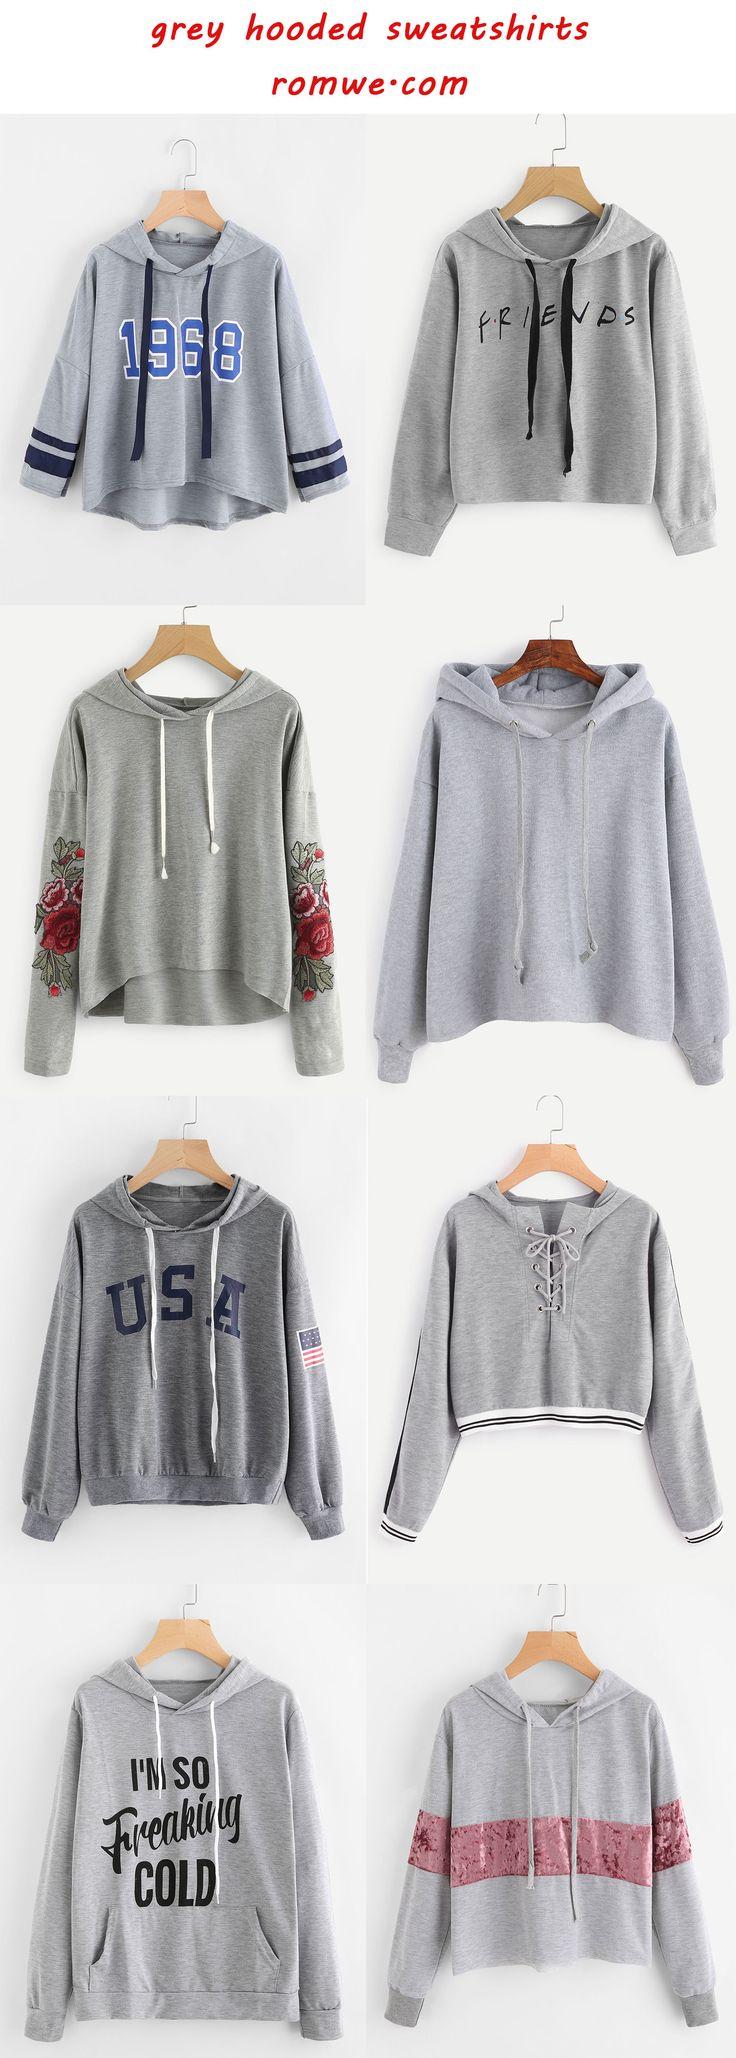 grey hooded sweatshirts 2017 from romwe.com